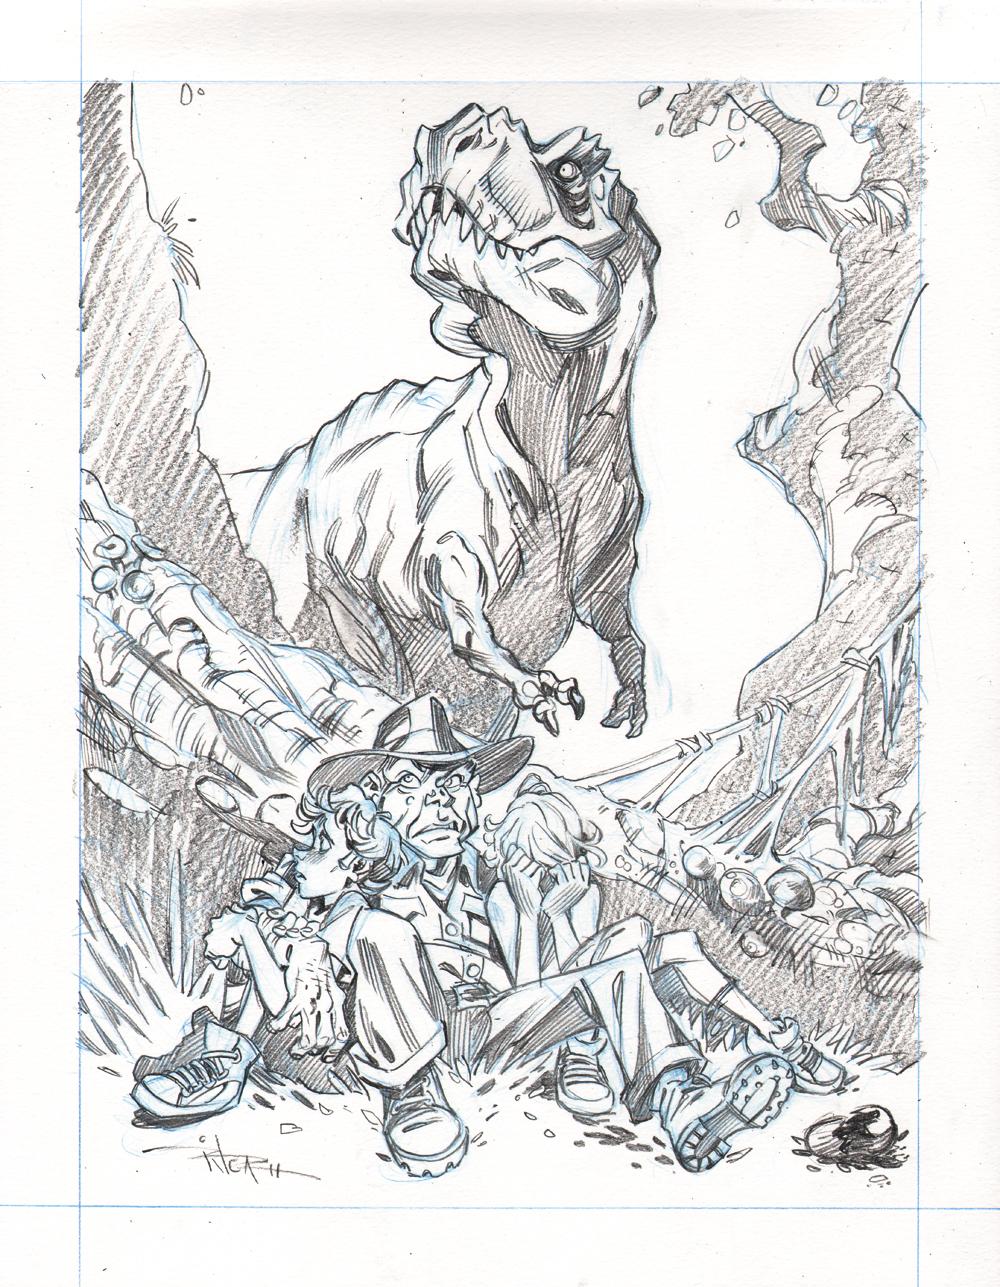 Line Art Vs Painting : Jurassic park by nrique on deviantart